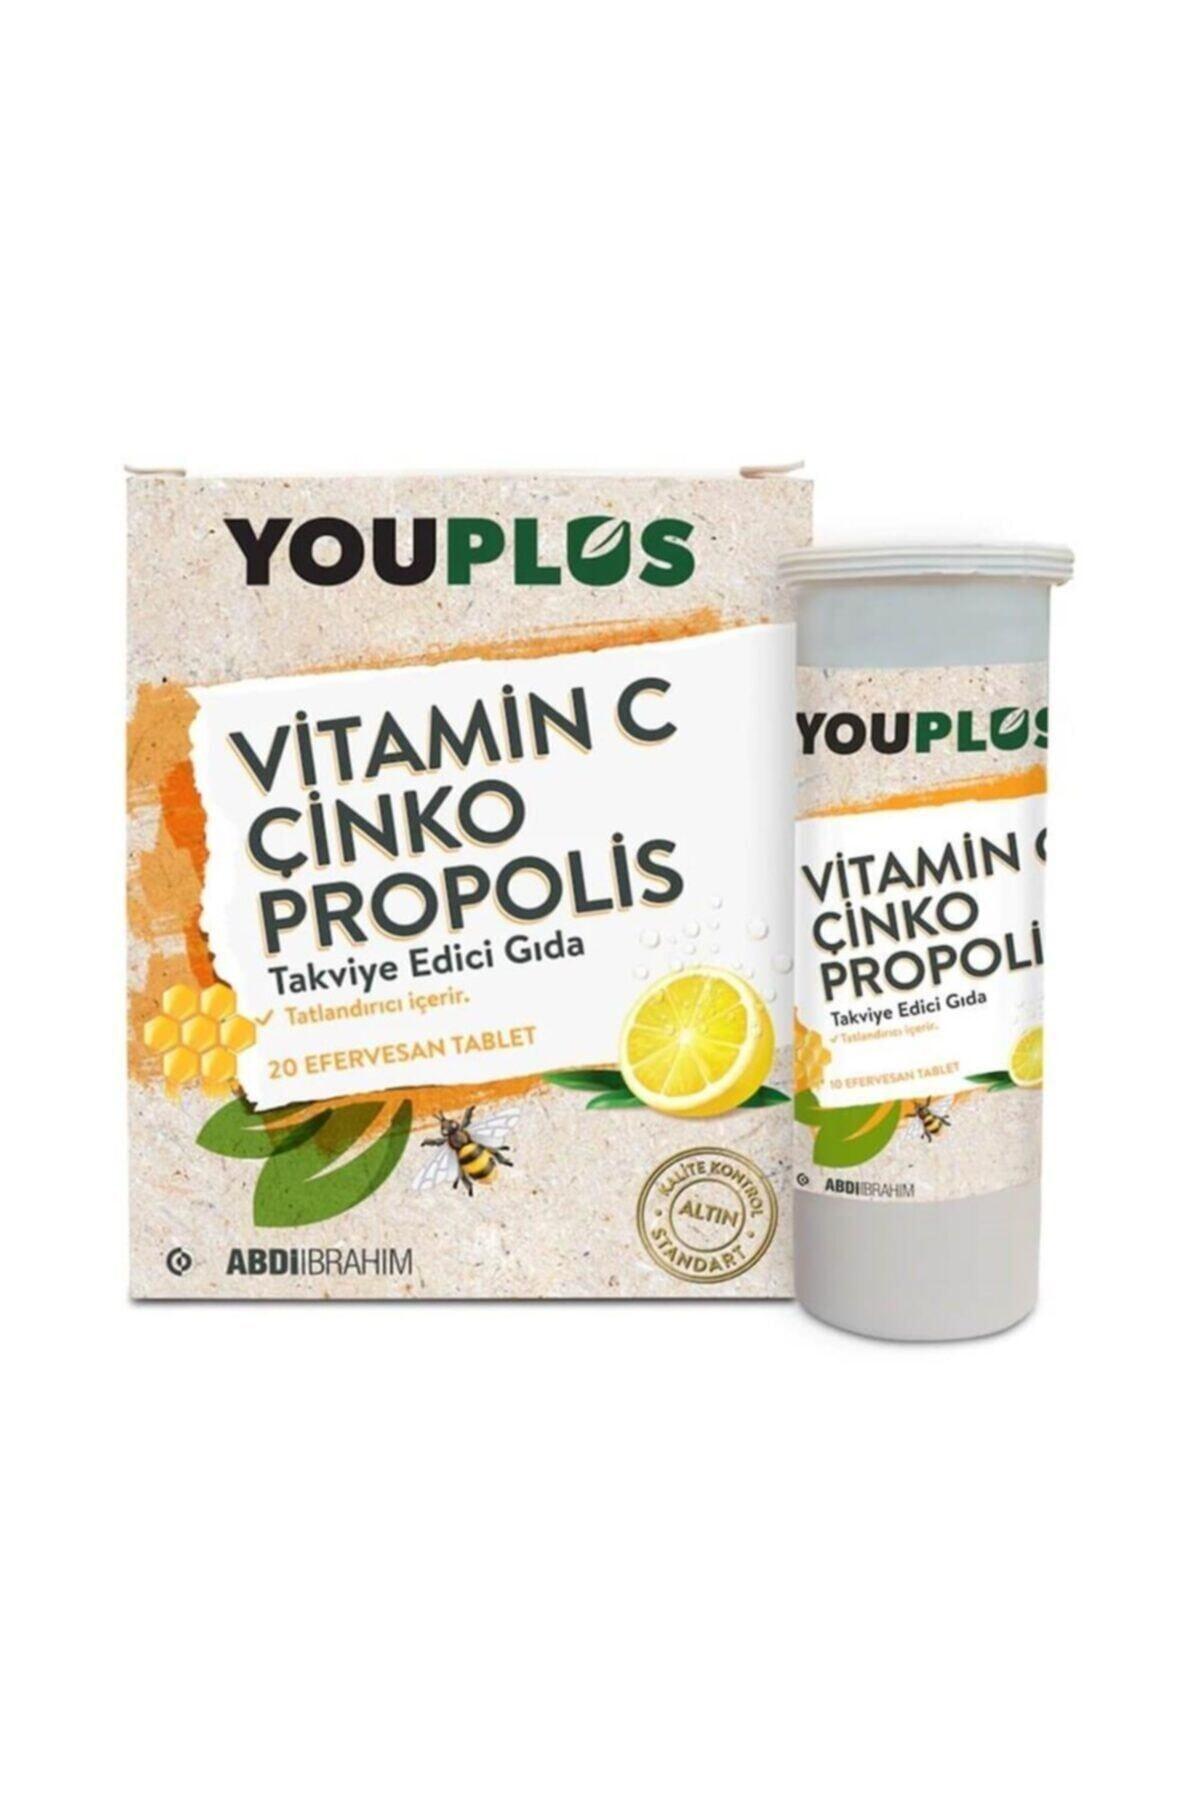 Youplus Vitamin C & Çinko & Propolis 20 Efervesan Tablet 1